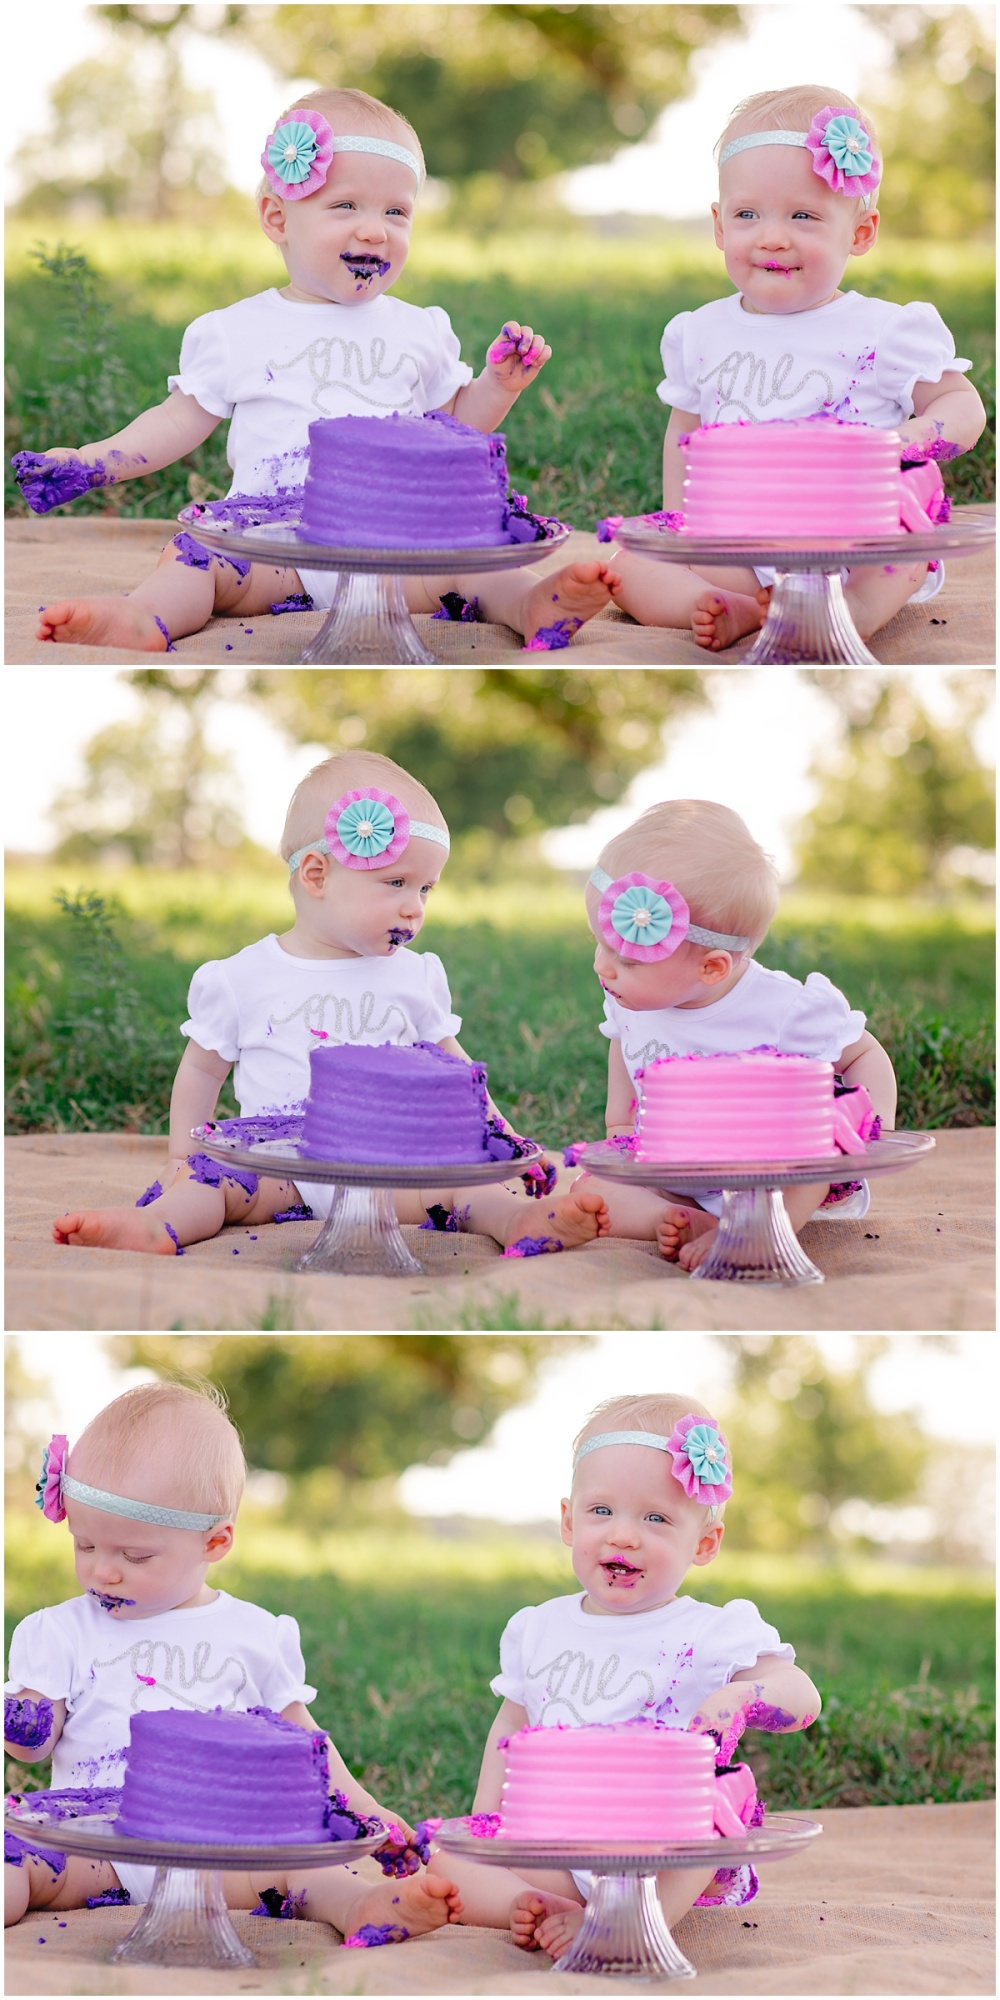 Family-Children-Portraits-Cake-Smash-Photos-San-Antonio-Hill-Country-Texas-Carly-Barton-Photography_0012.jpg